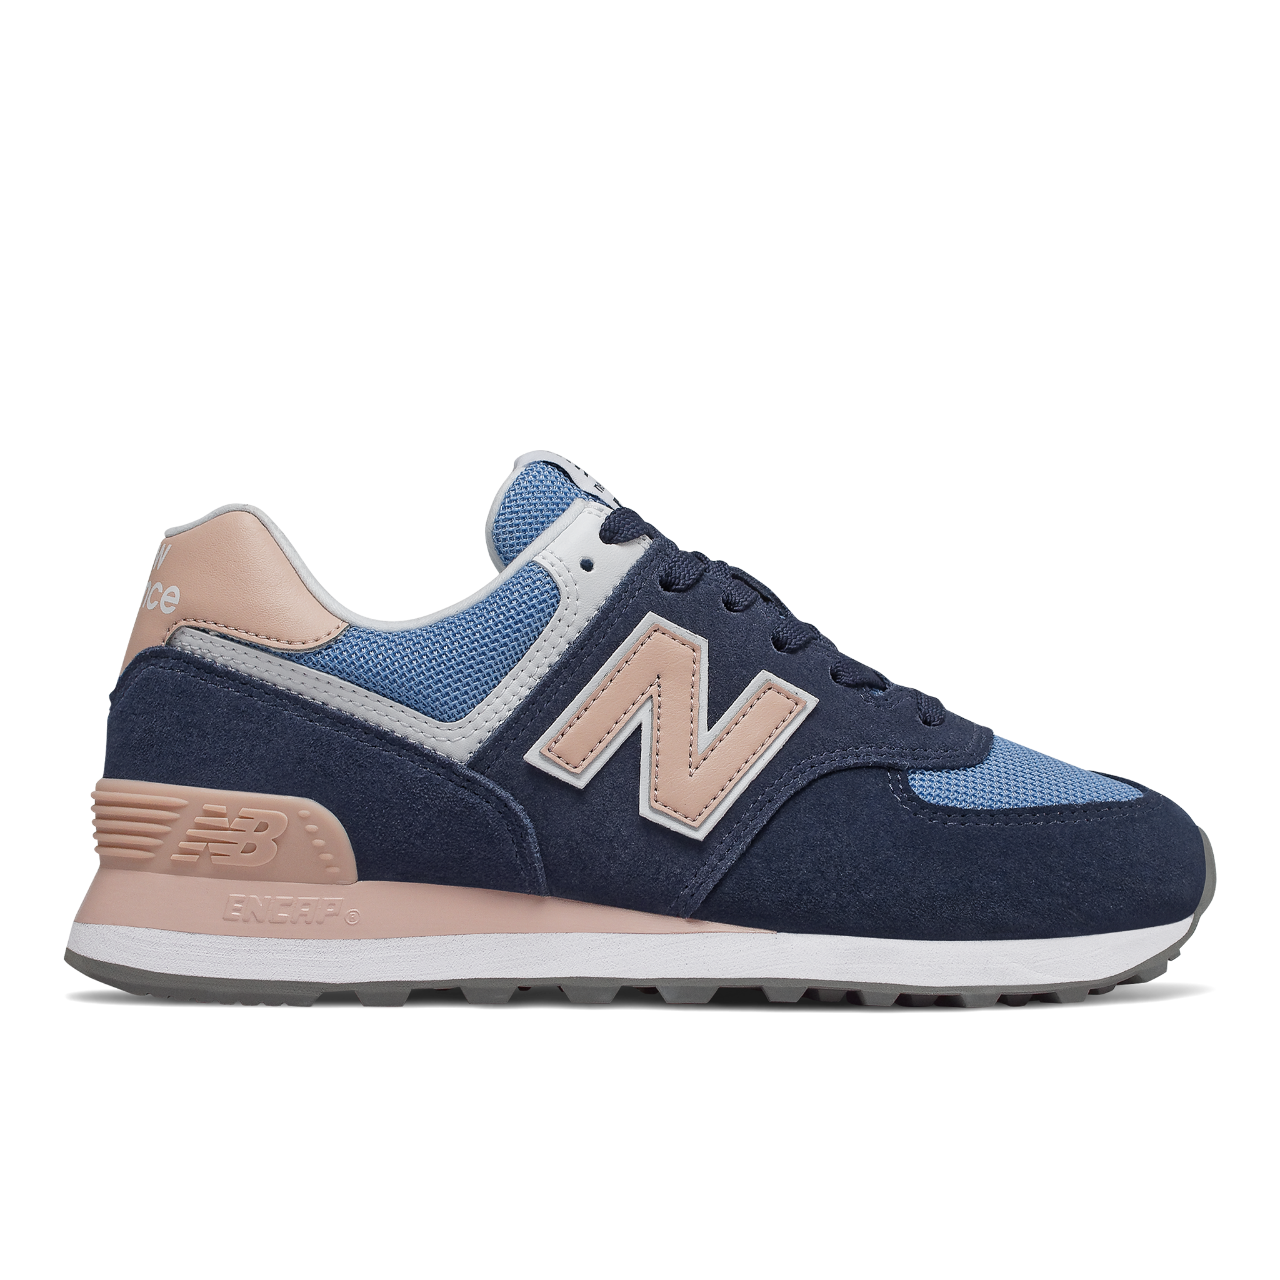 finest selection a8767 1ed93 New Balance 574 WND-Sneaker damen blau rosa